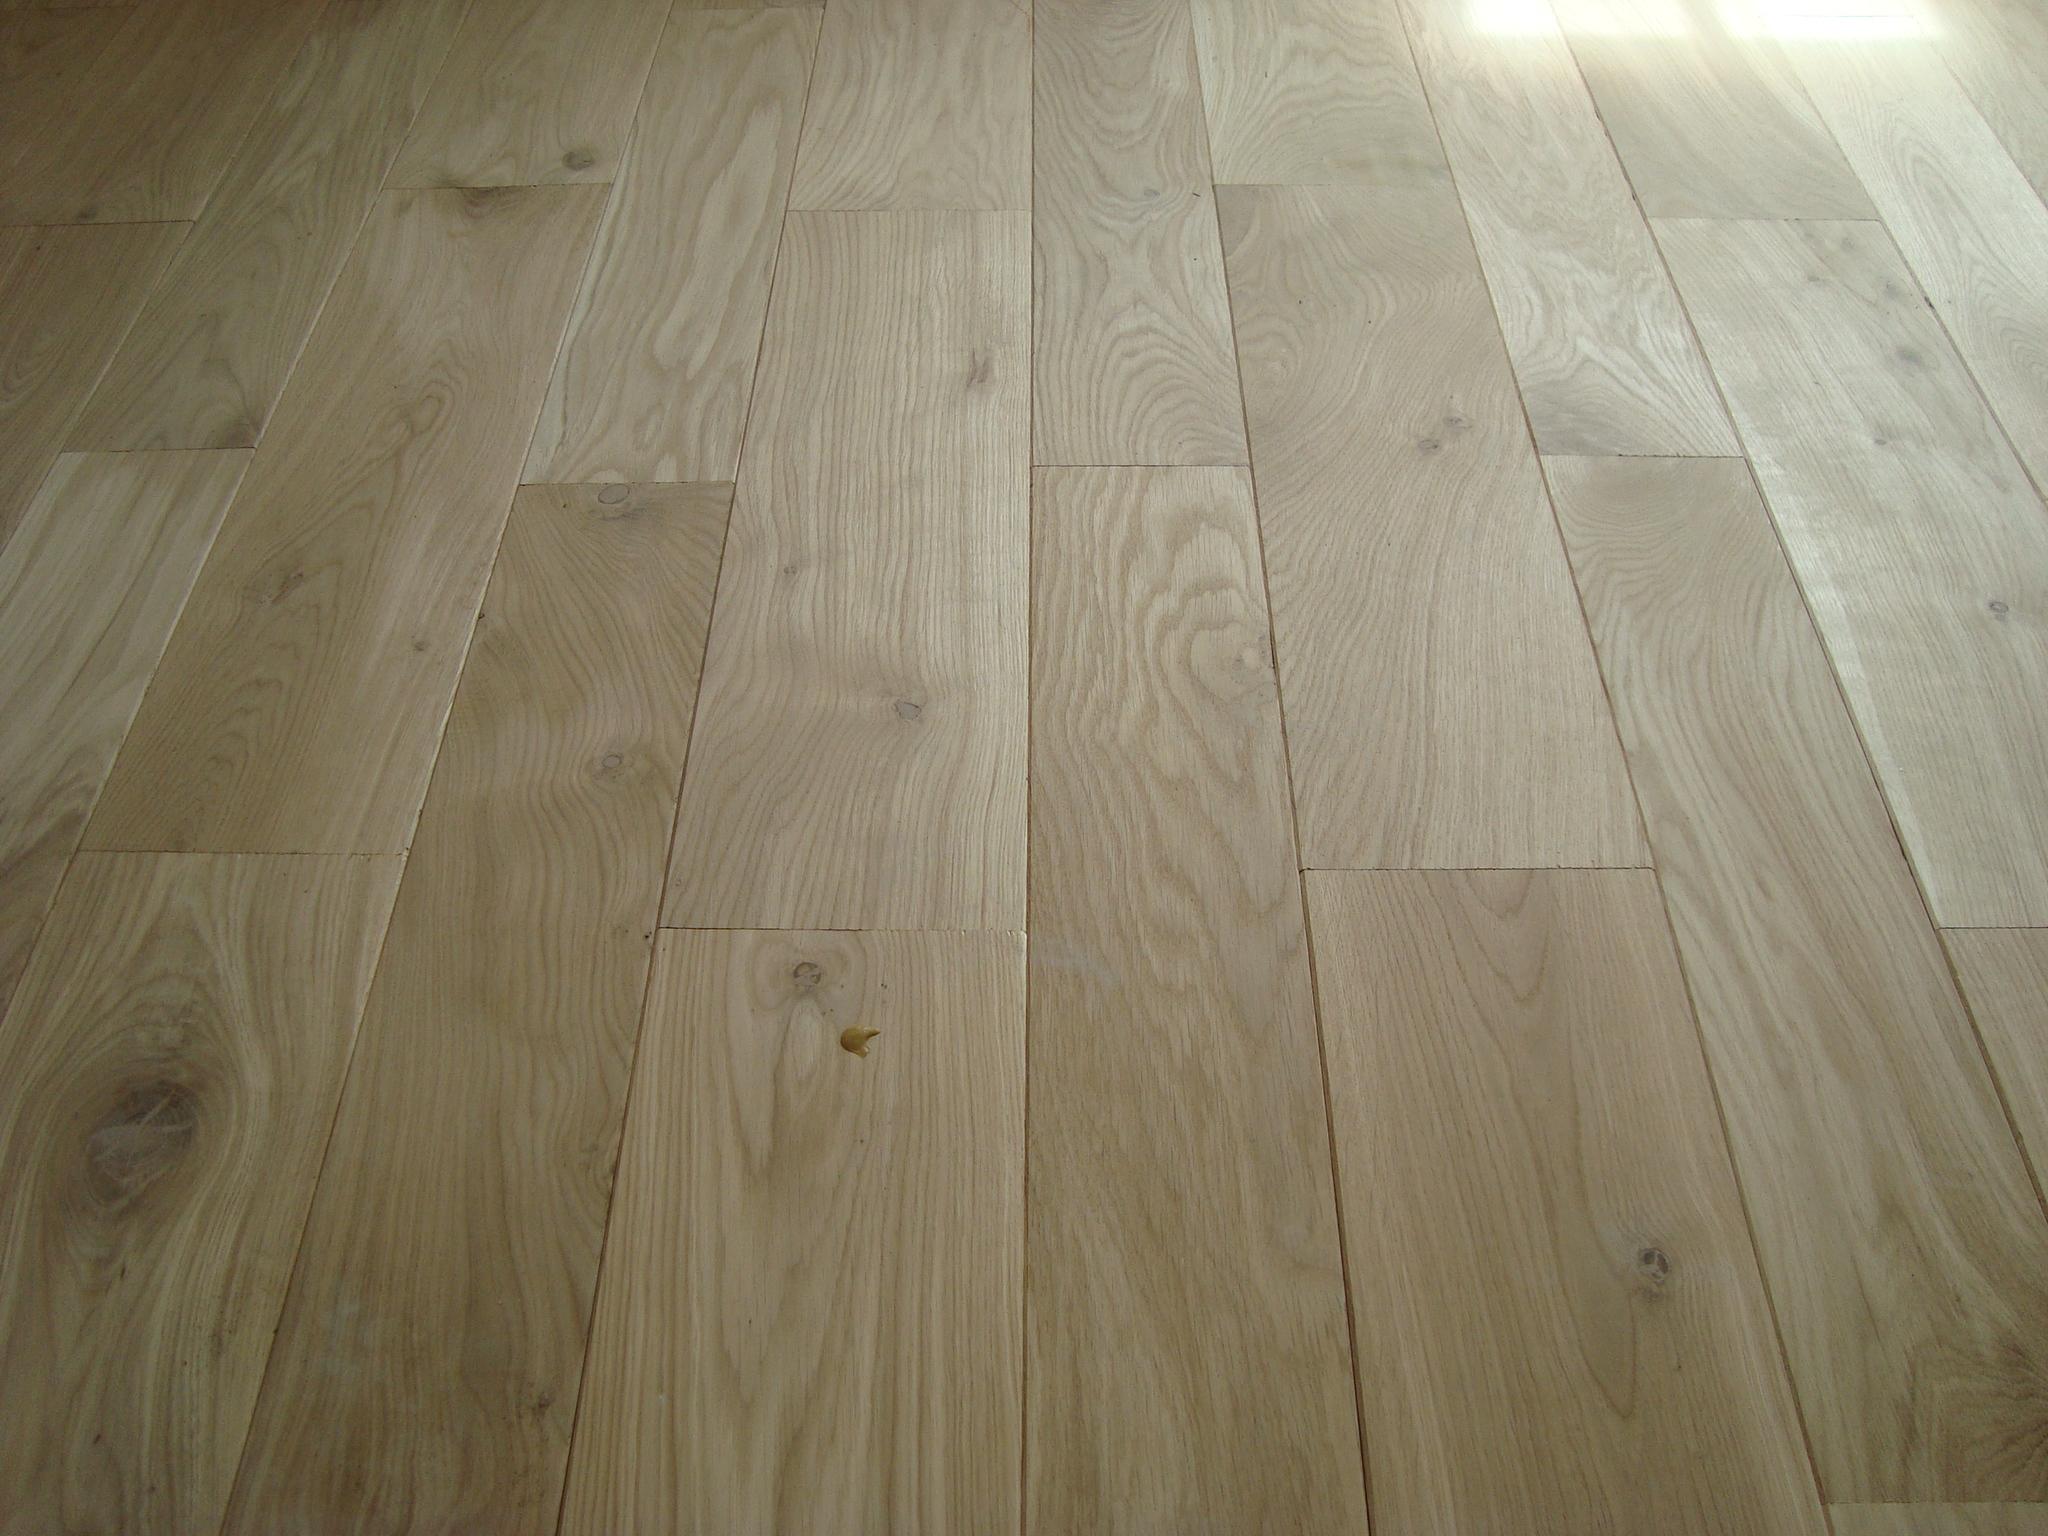 "Massiivpõrand tamm,"" Lühike Natur-Rustik"" 1MP10 | 1 Solid wood flooring Oak Natur Rustic Short"